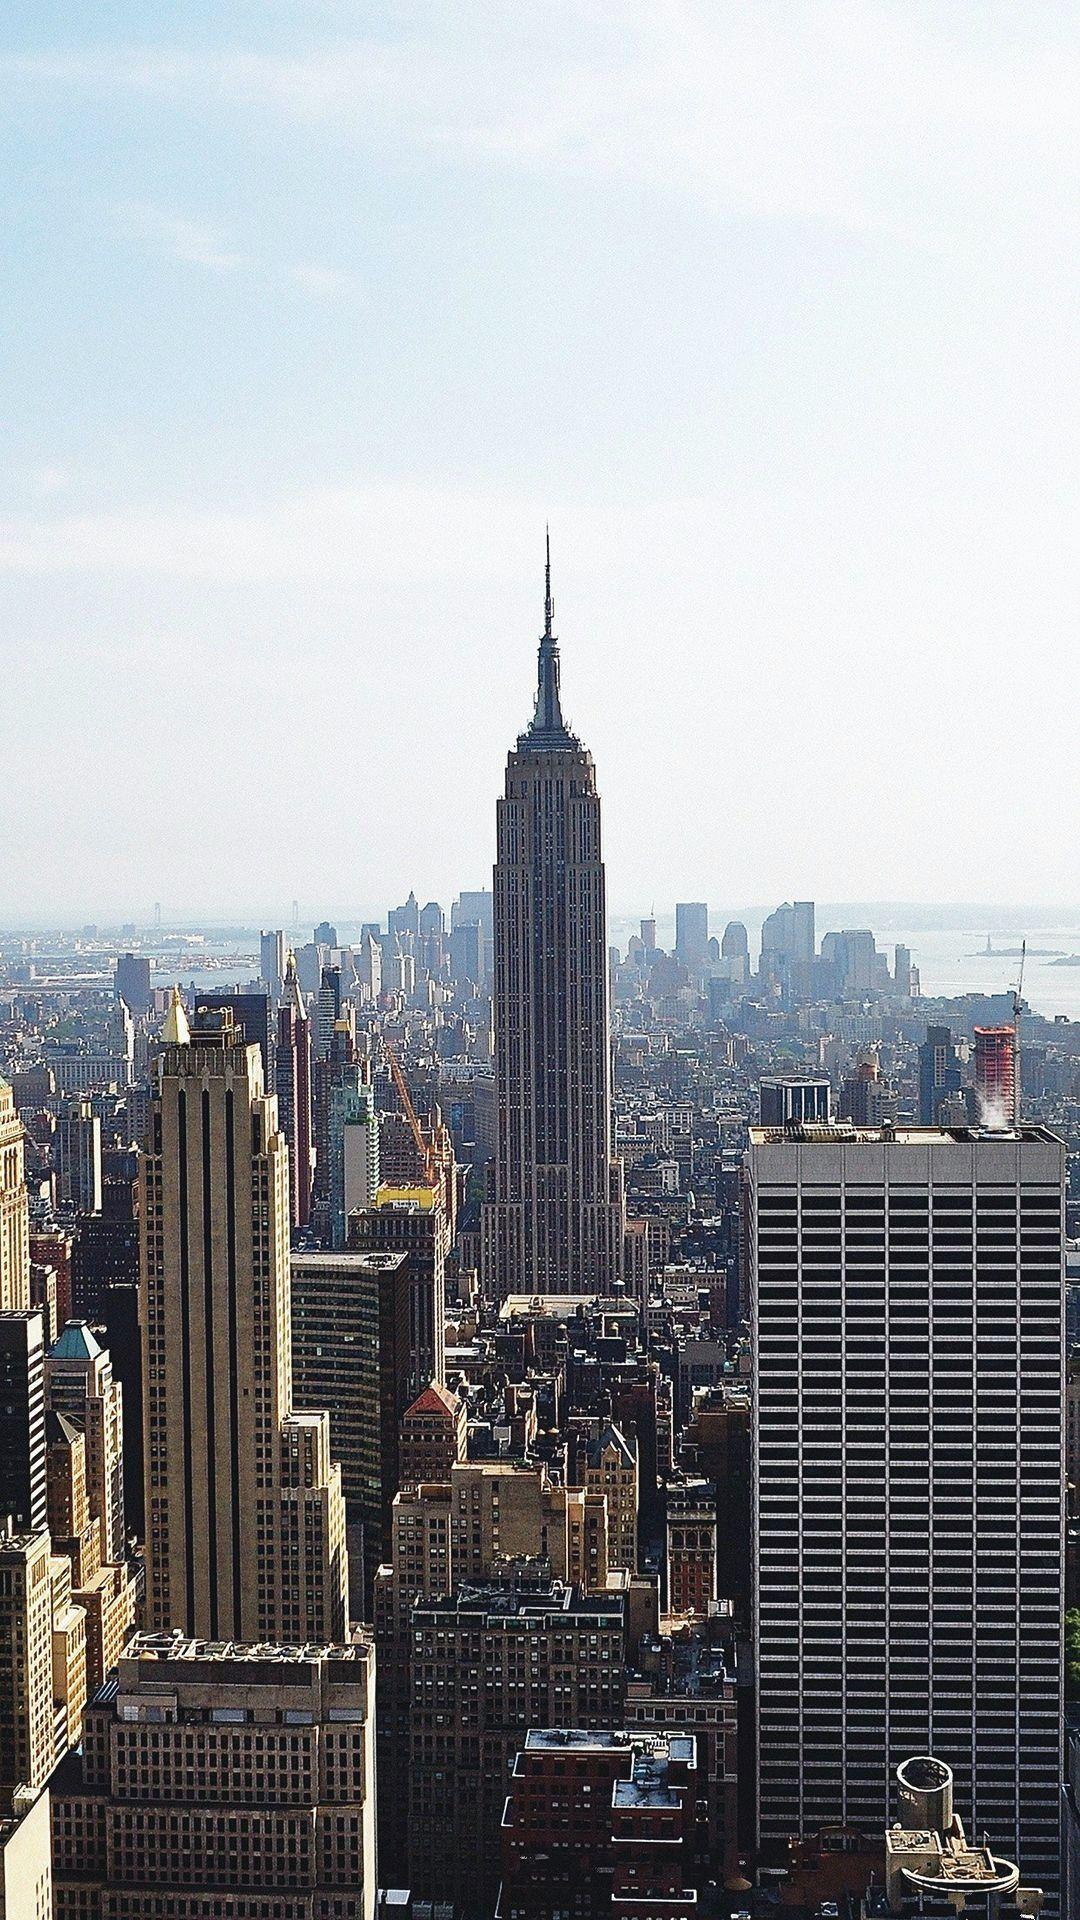 Building Architecture City Newyork Empire Usa Iphone 6